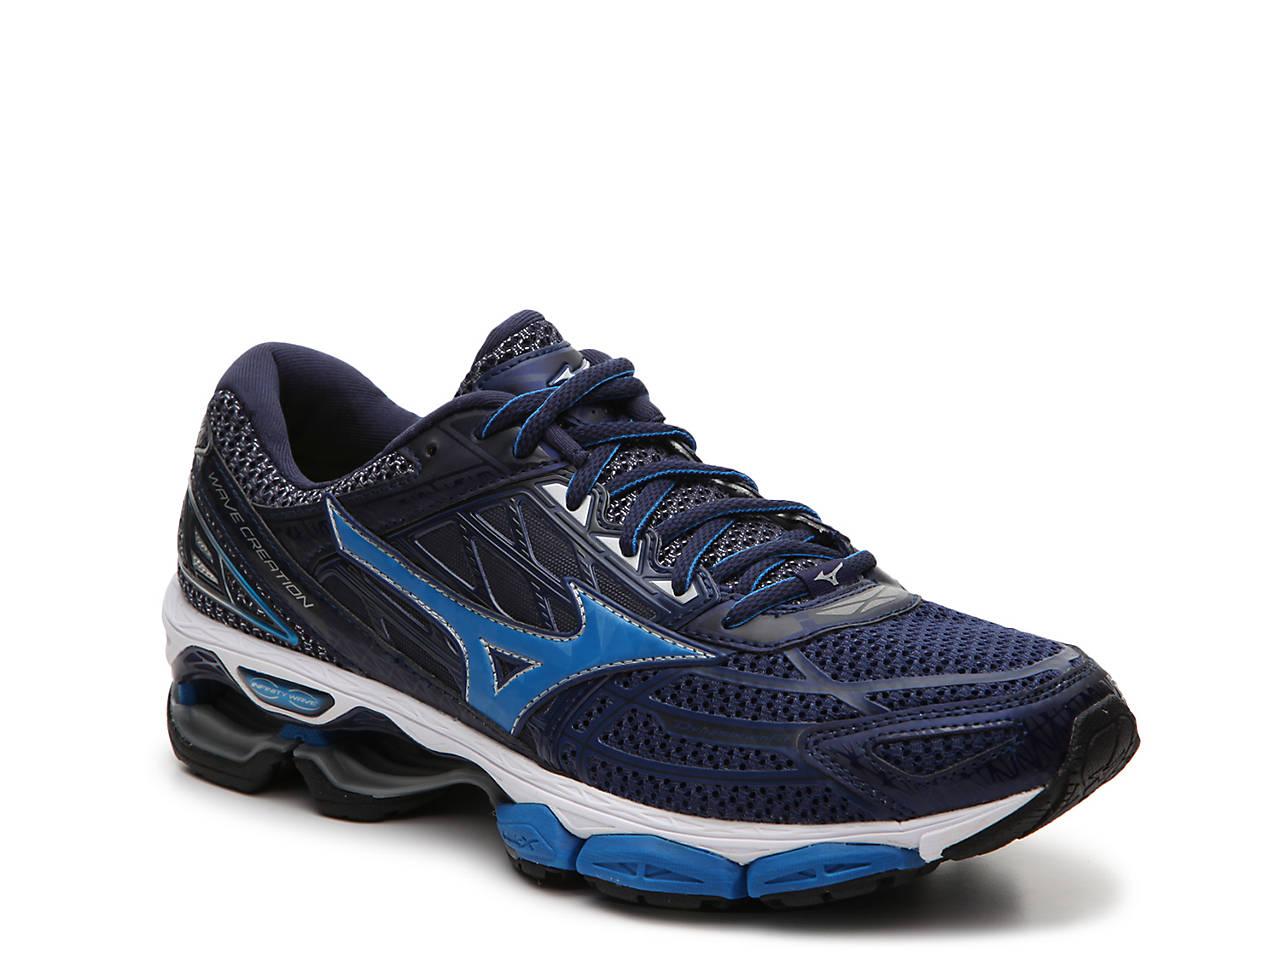 Mizuno Wave Creation 19 Performance Running Shoe - Men s Men s Shoes ... 792ce31d33a